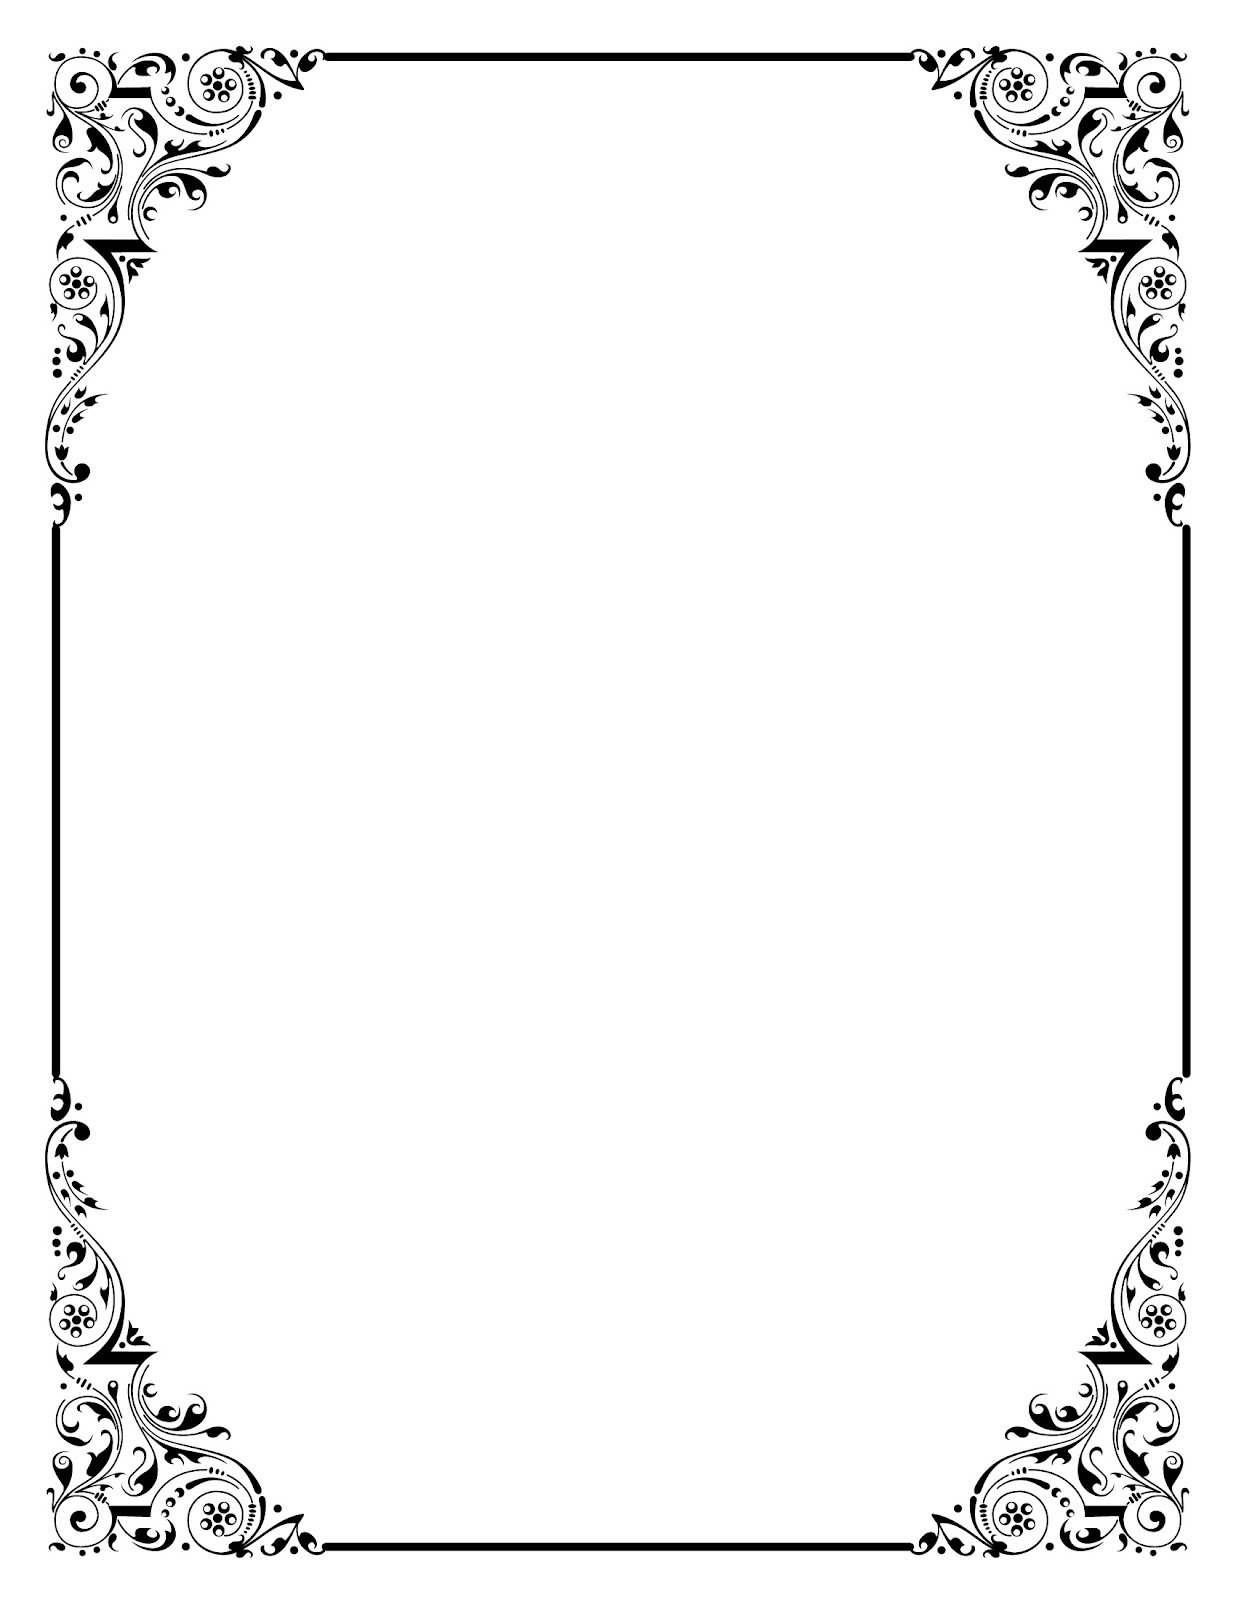 frames clip art borders